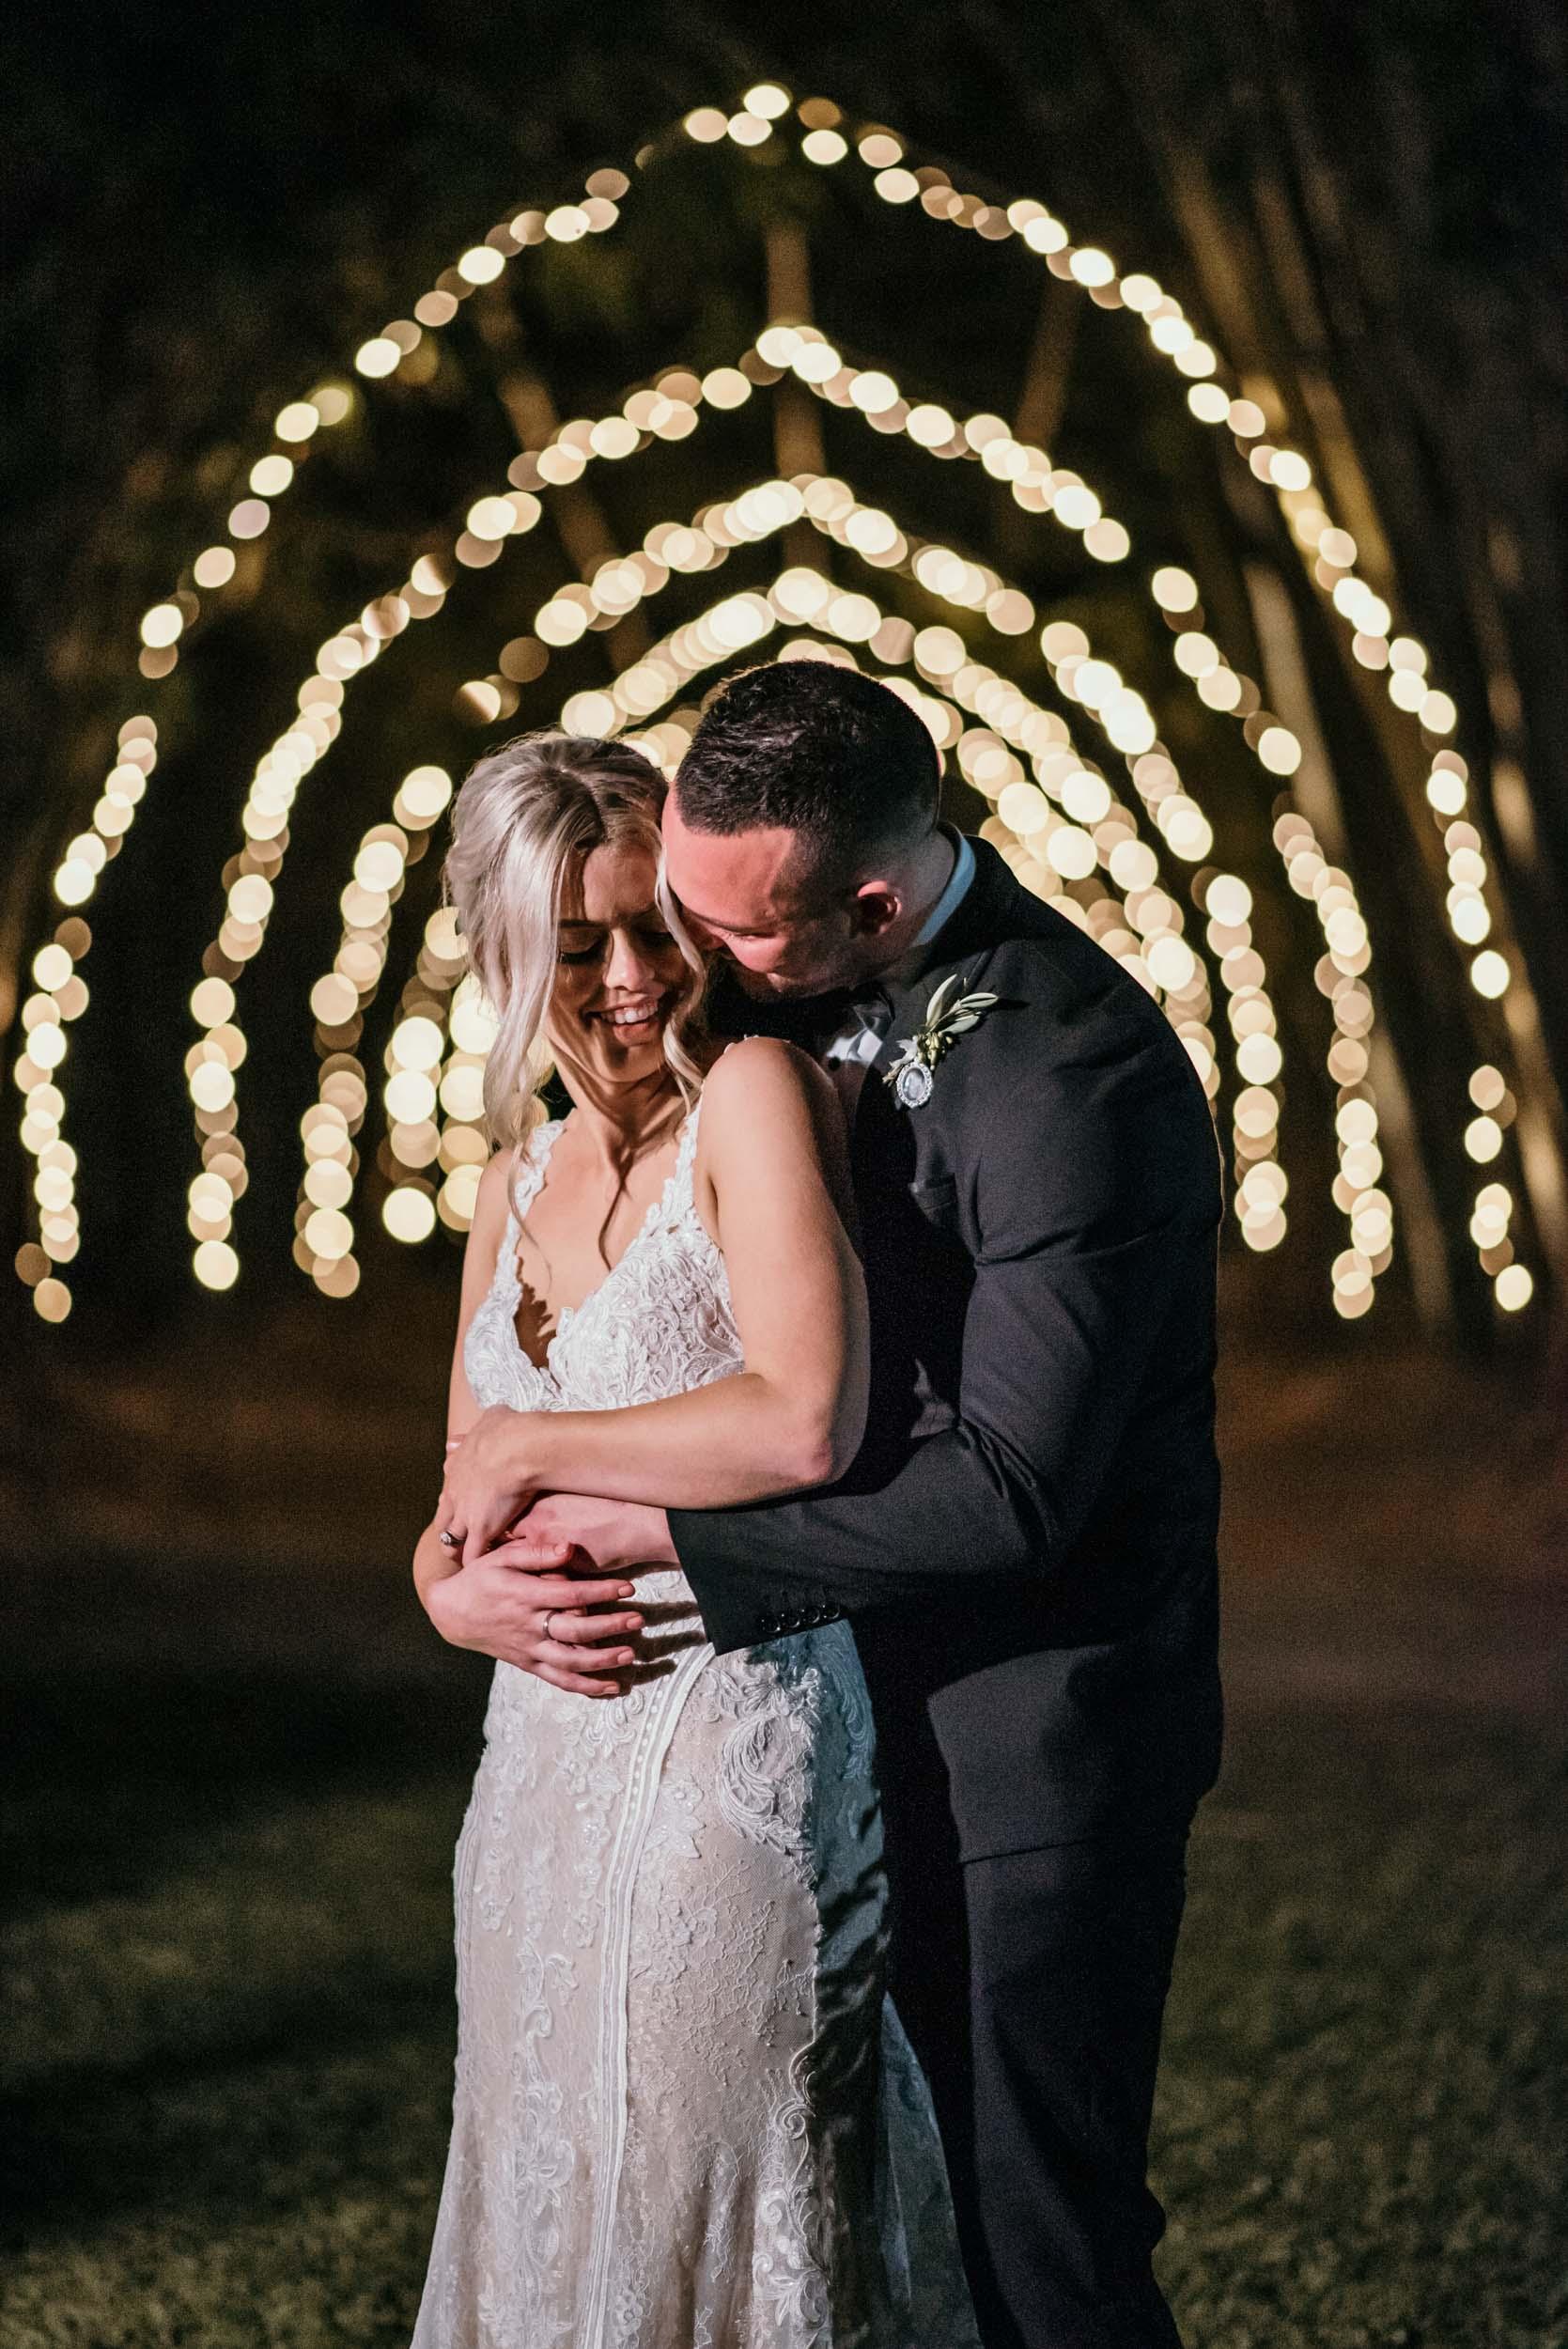 The Raw Photographer - Cairns Wedding Photographer - Laloli - Cairns Garden Wedding - Bride Dress - Destination Wed - Outdoor Reception - Queensland Ceremony-71.jpg